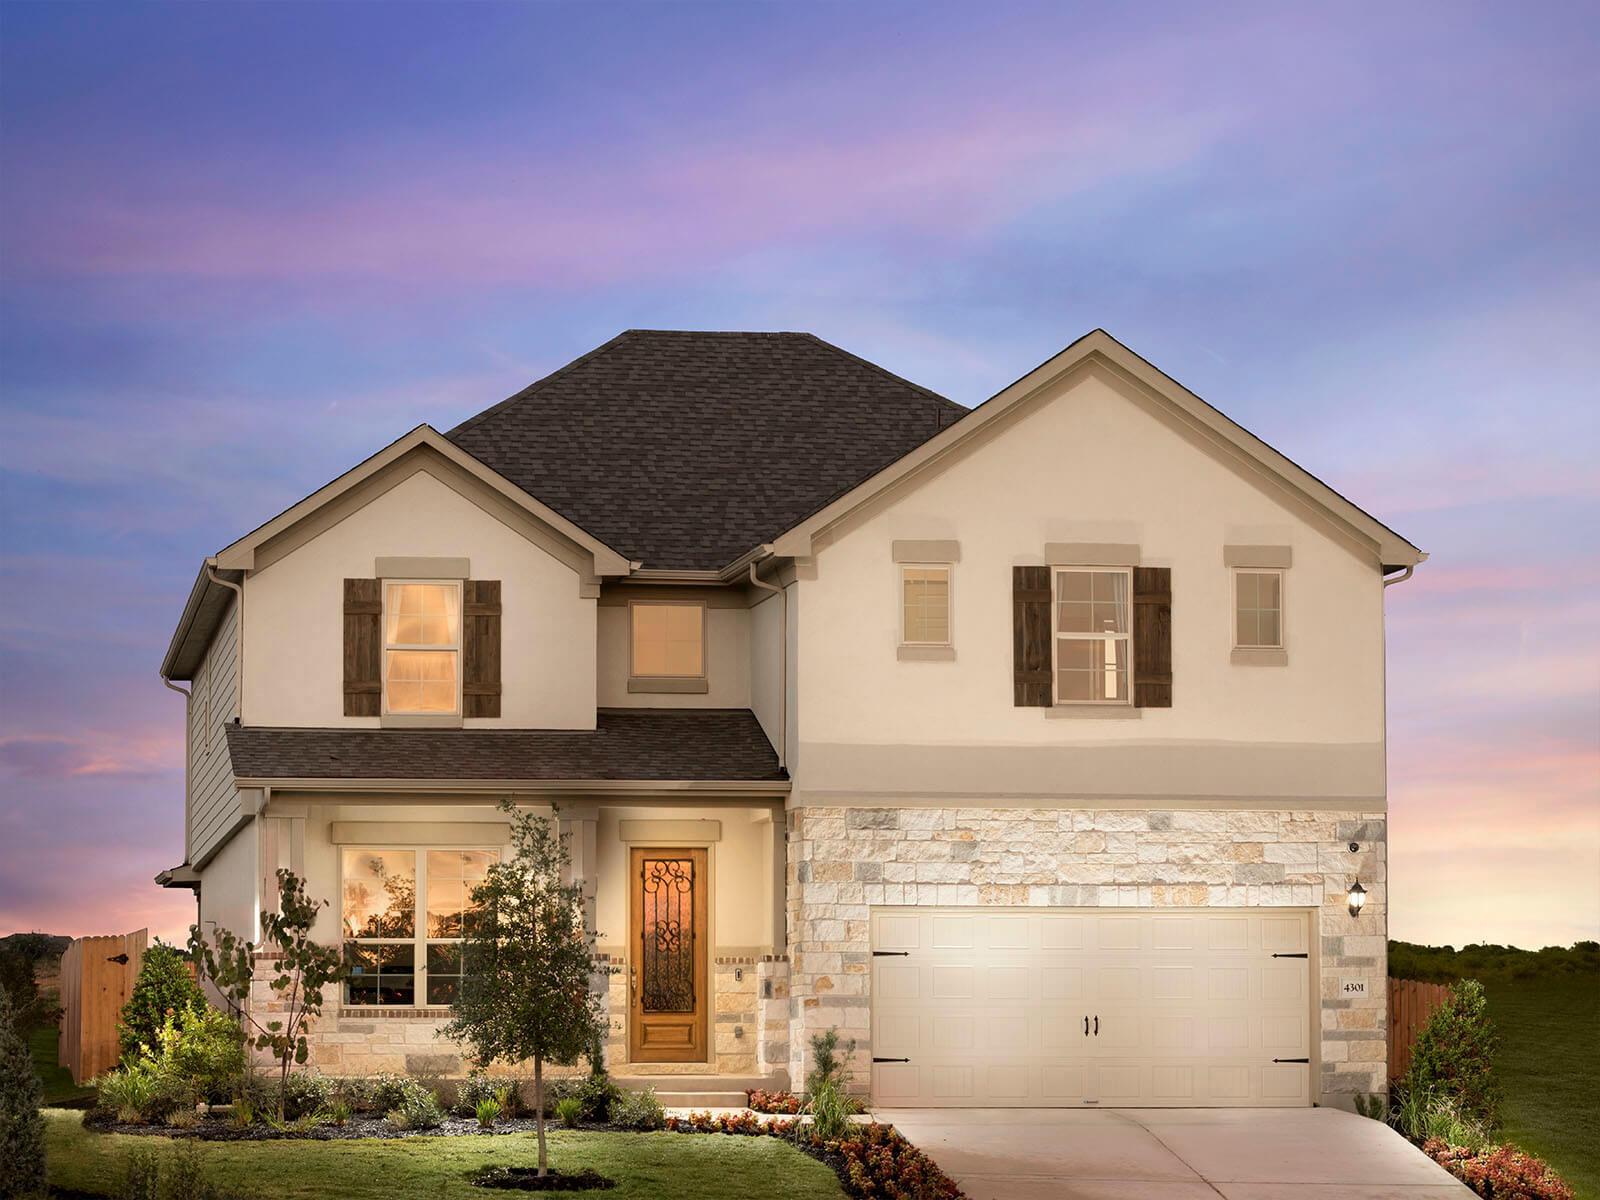 Vista Vera new homes in Georgetown TX by Meritage Homes